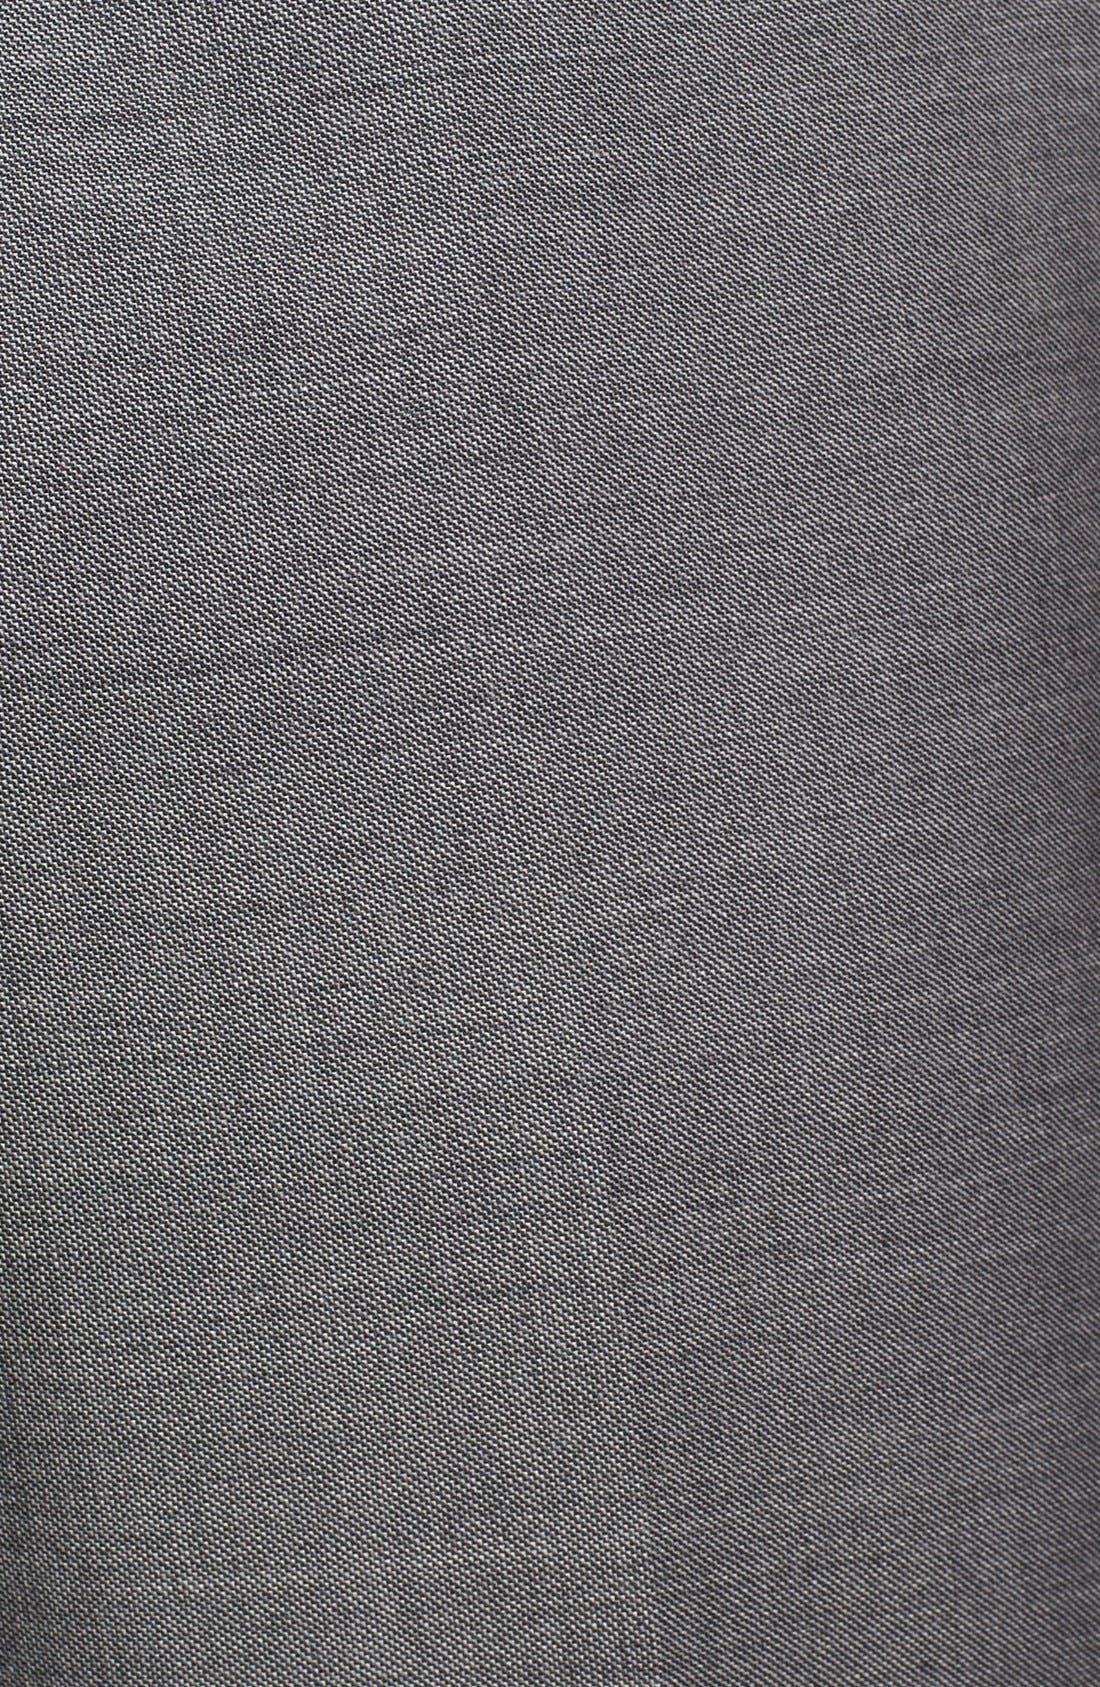 Alternate Image 3  - BOSS HUGO BOSS 'Sharp' Flat Front Wool Trousers